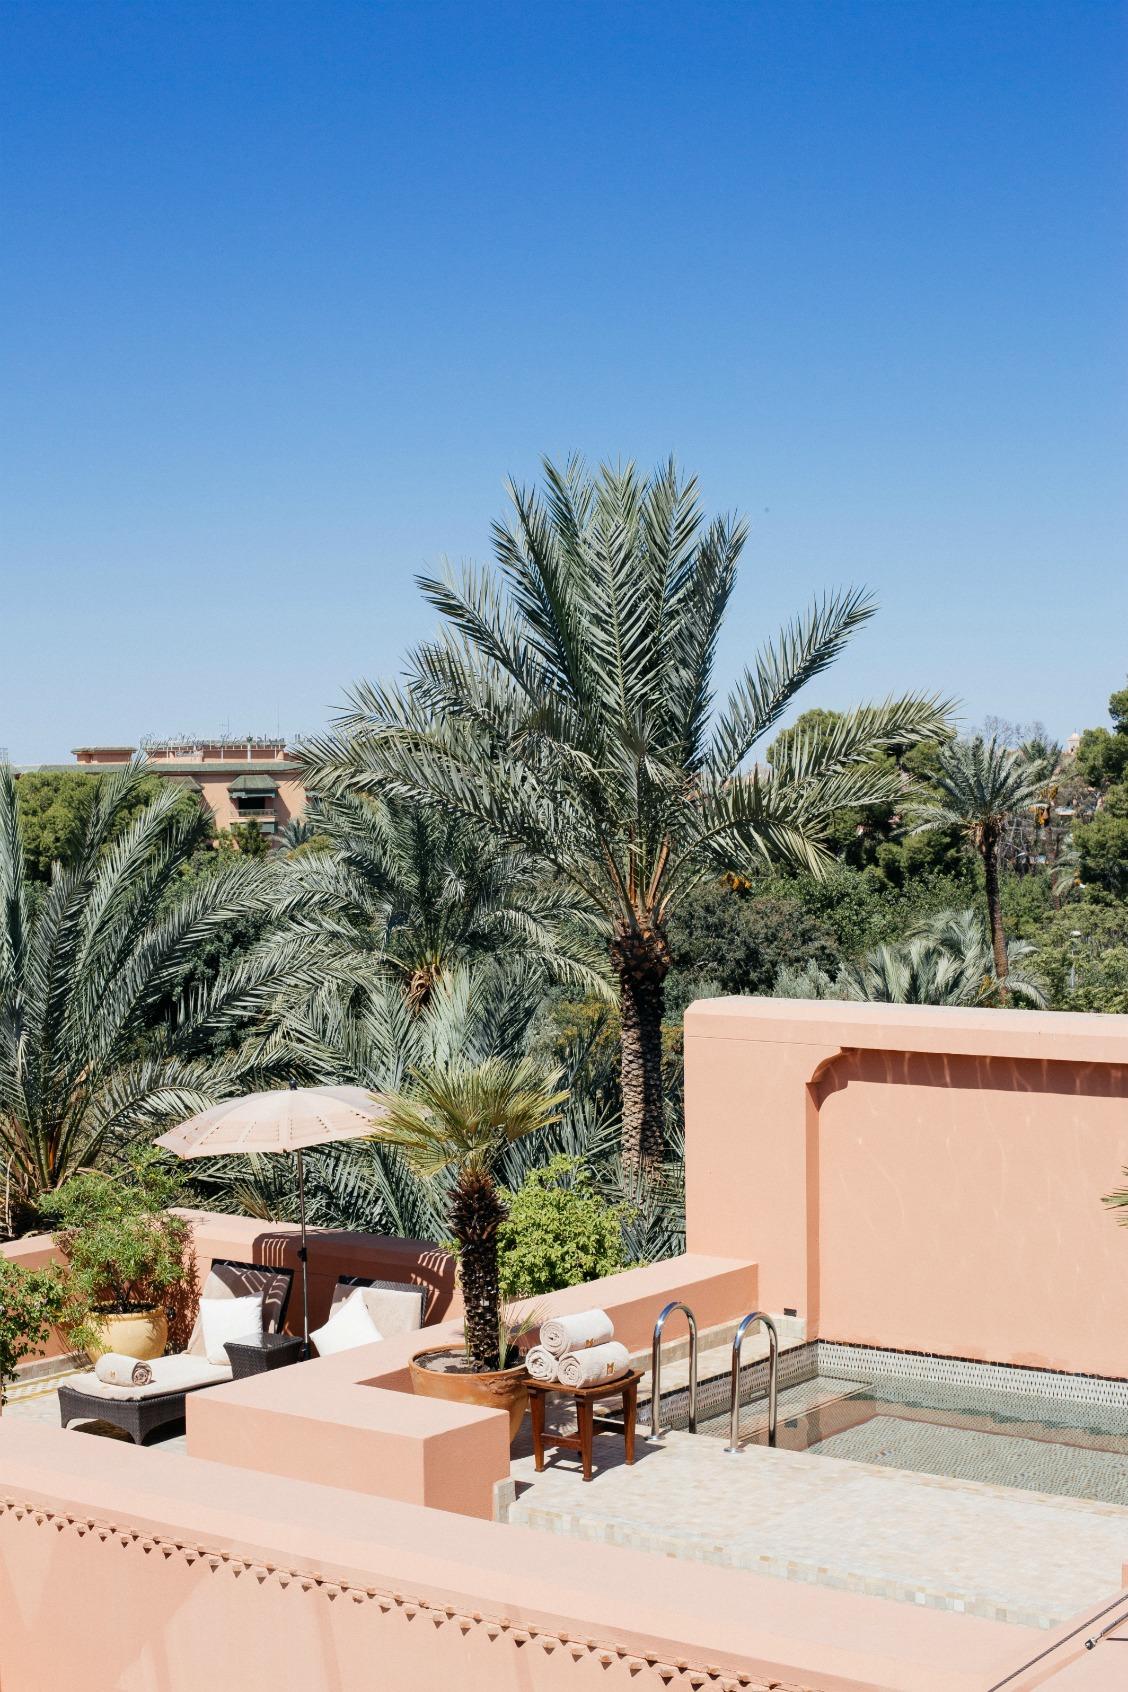 royal-mansour-hotel-luxury-marrakesch-marrakesh-morocco-edisa-shahini-disicouture-blog-03